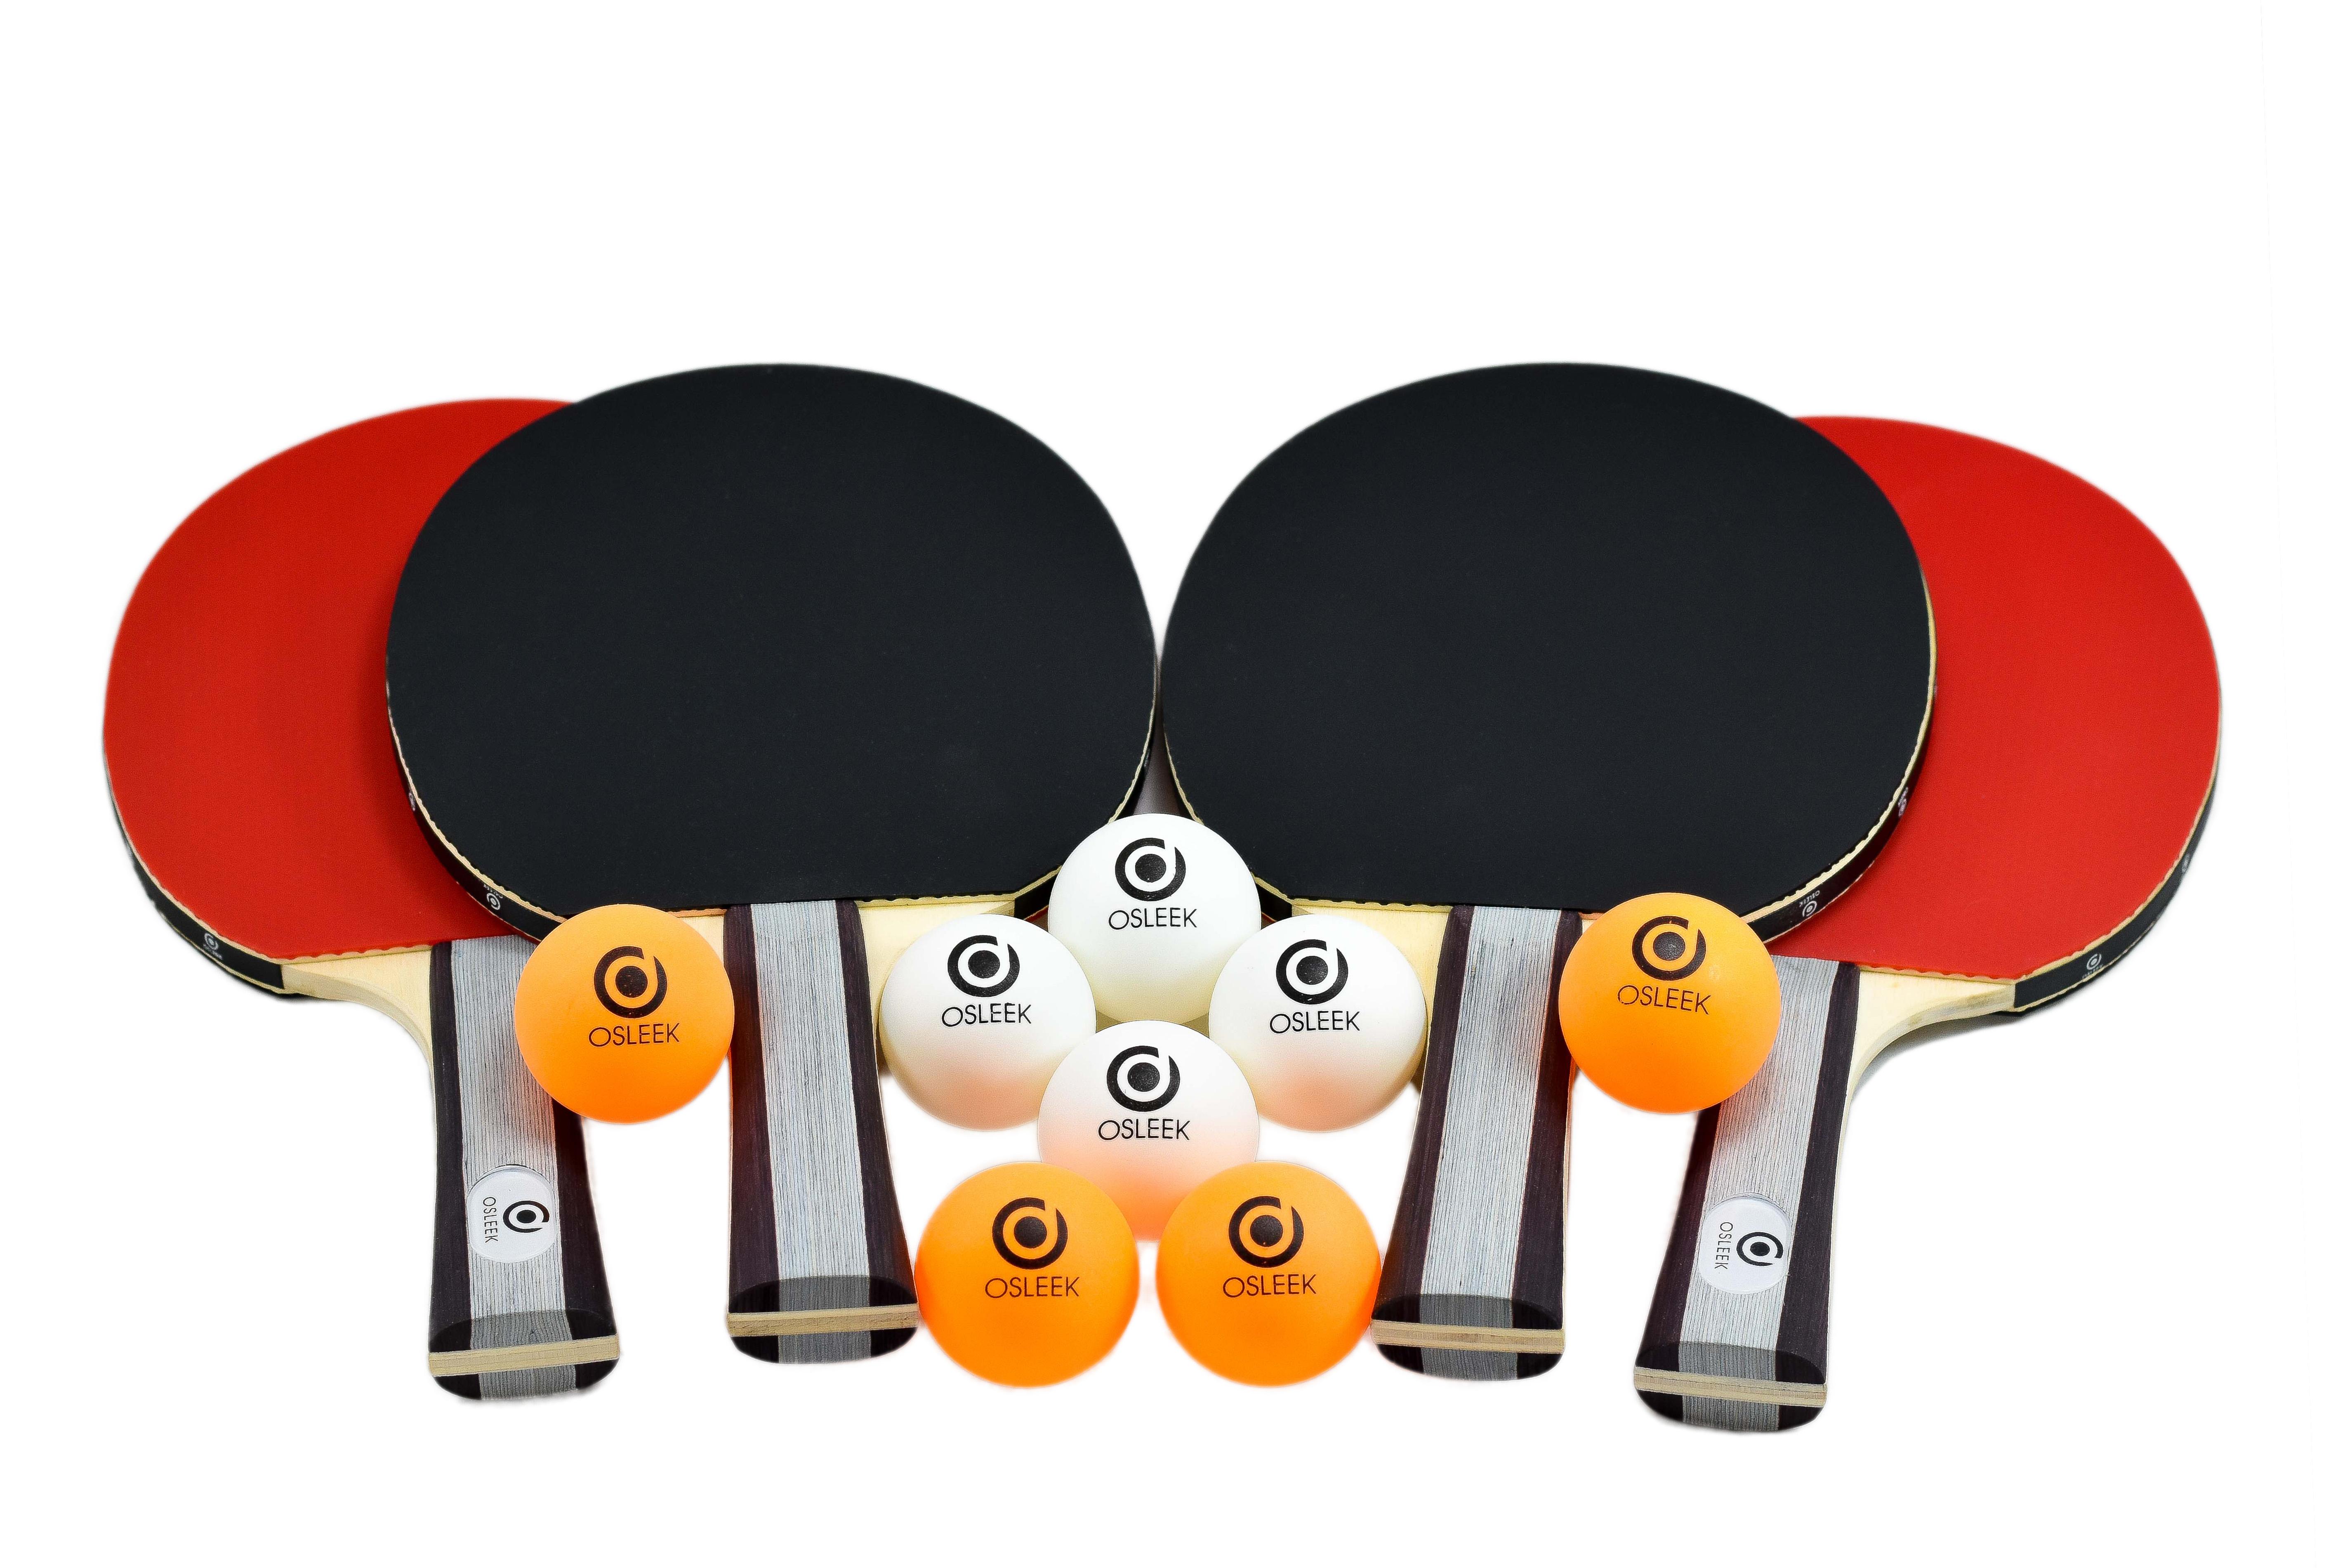 Osleek PingPong Set